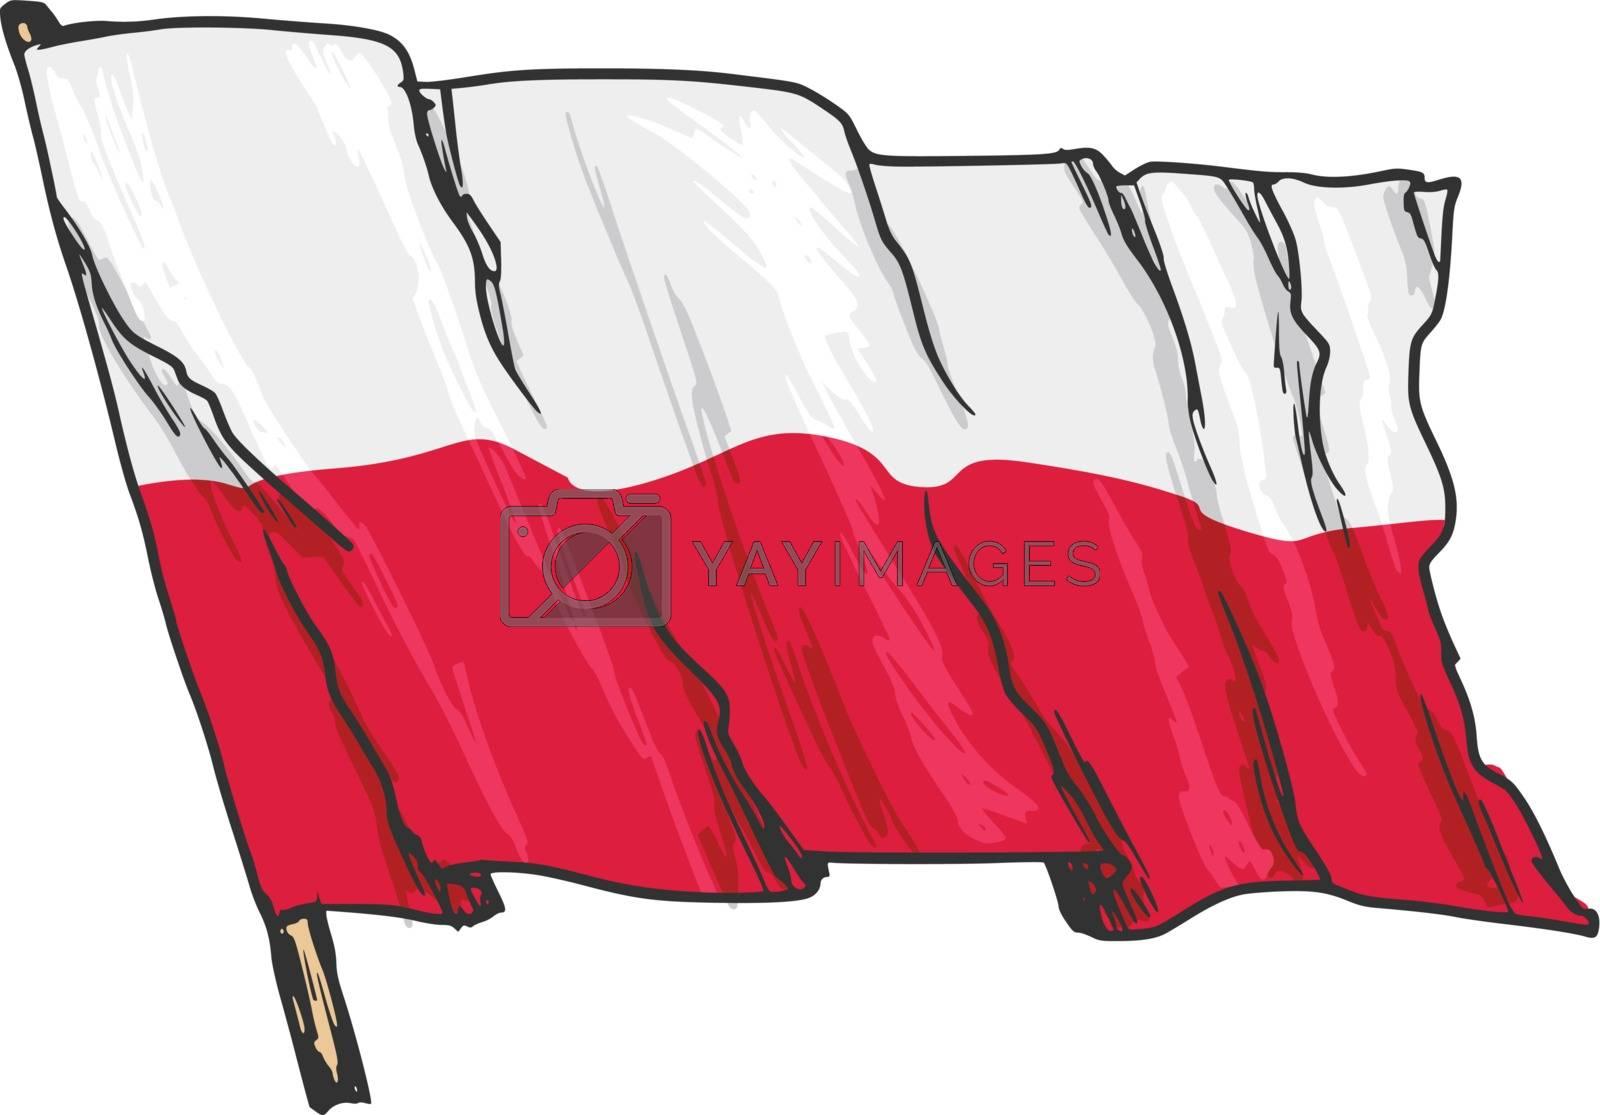 hand drawn, sketch, illustration of flag of Poland